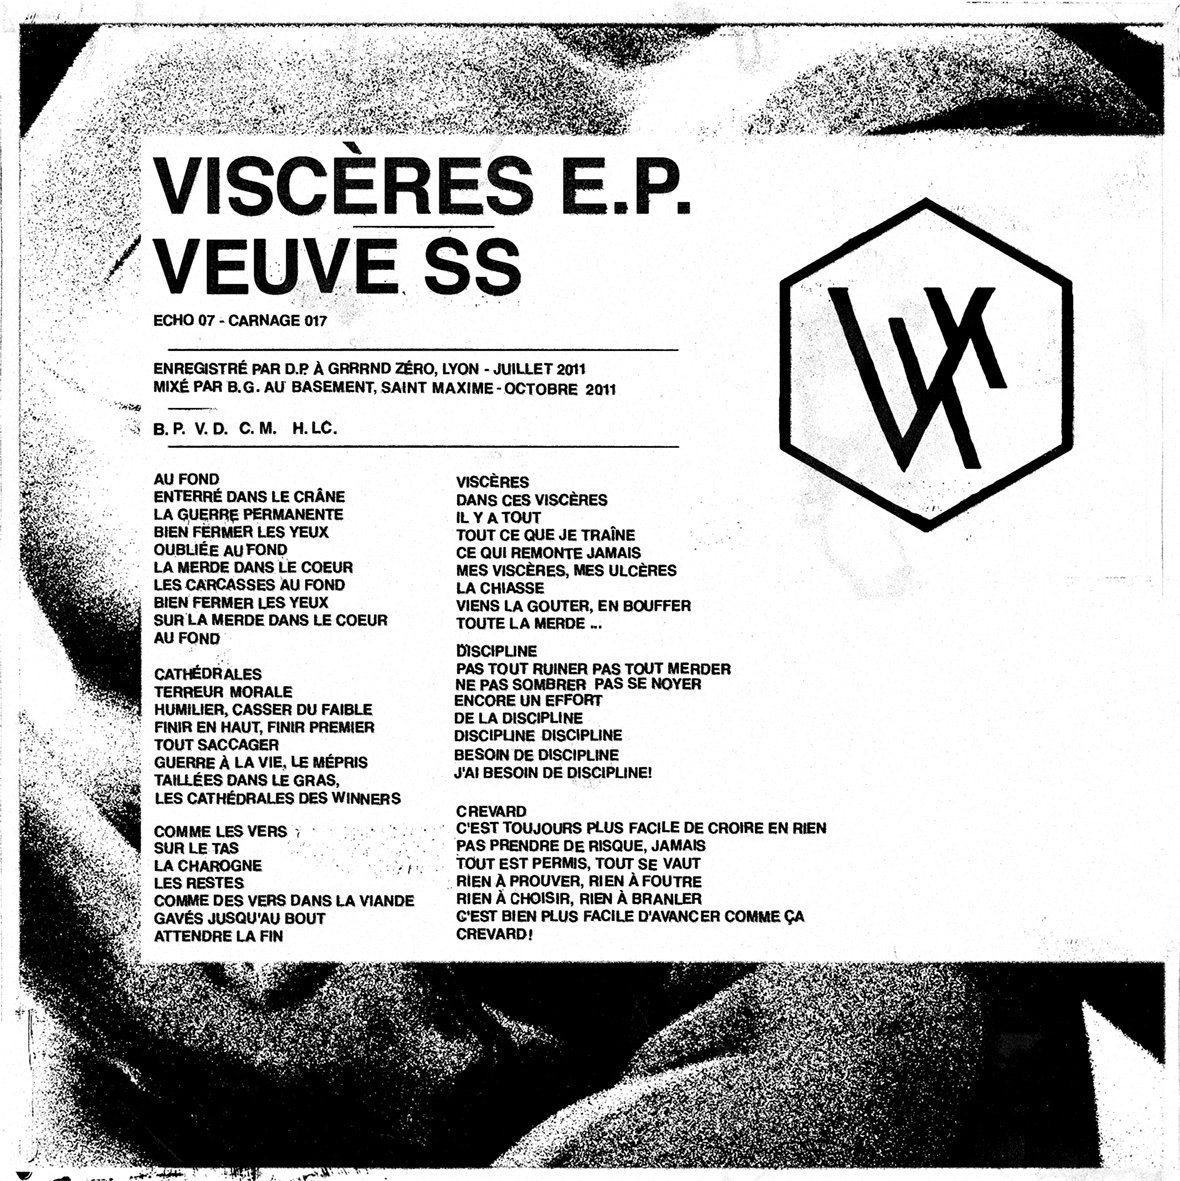 VEUVE S. S. - Viscère EP